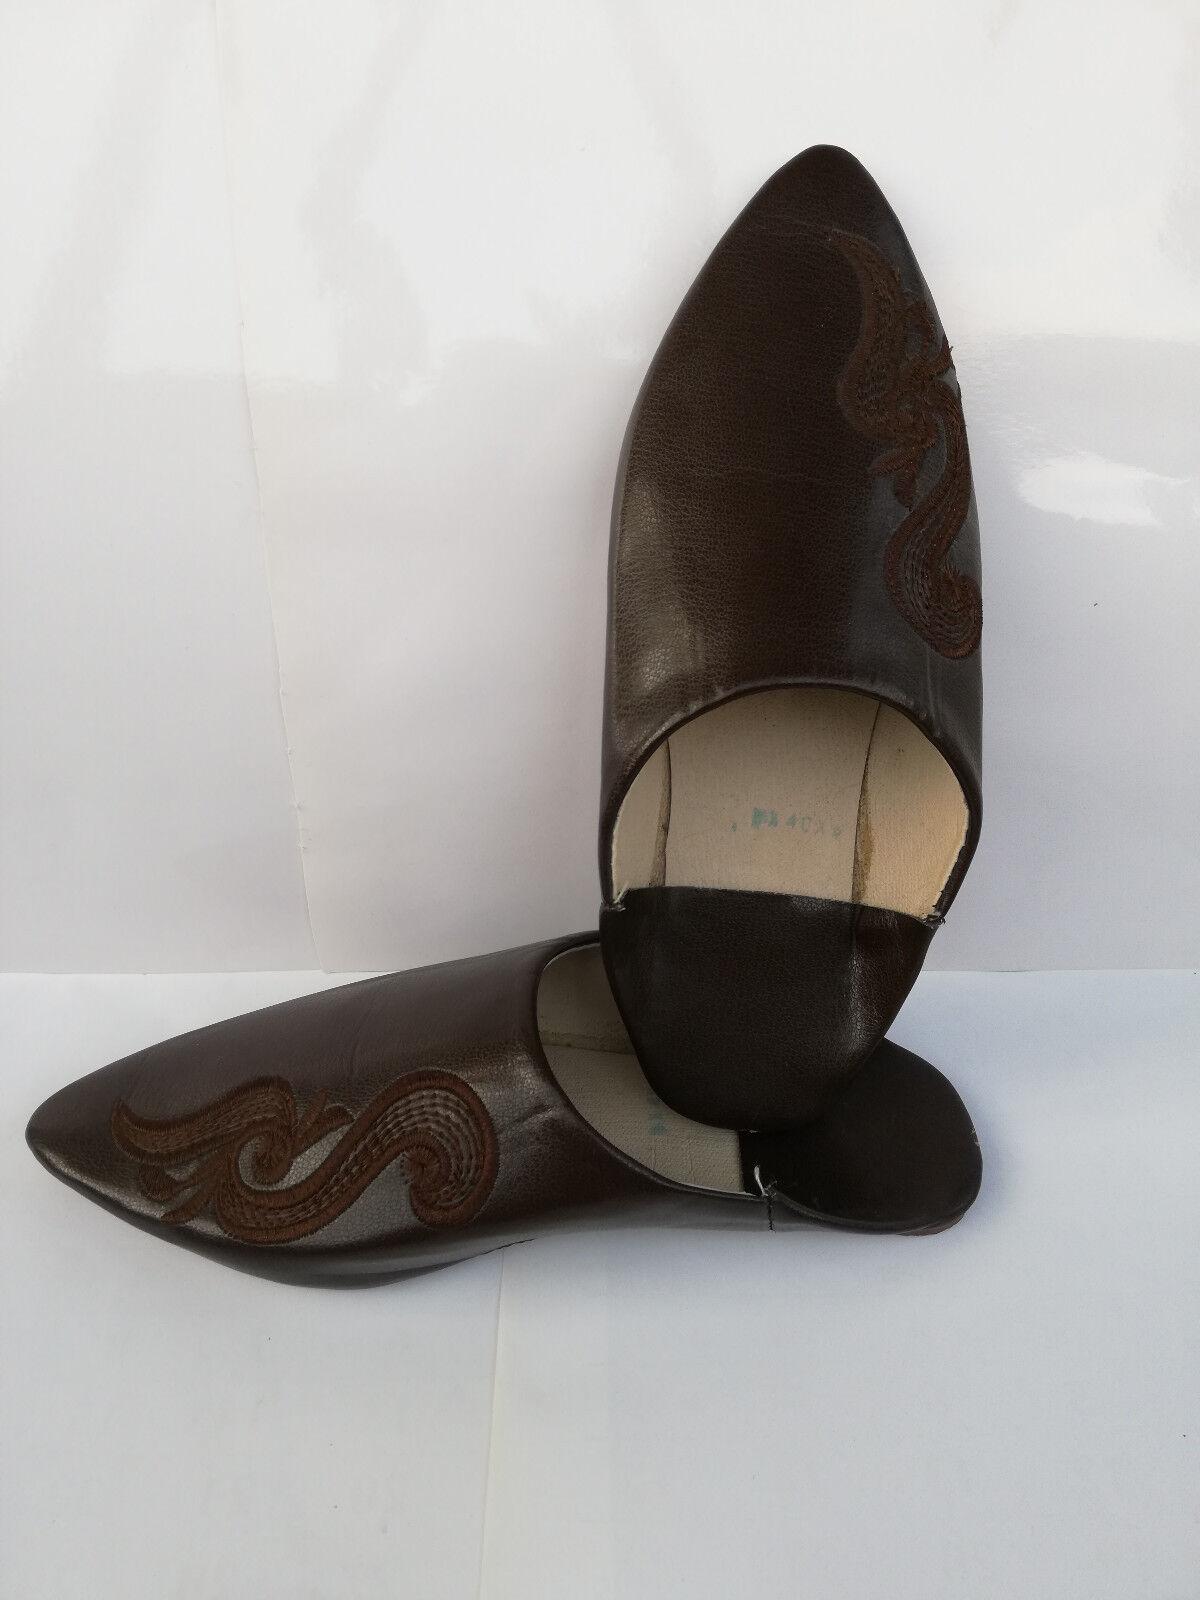 Amazing Moroccan Wouomo scarpe slippers Babouche Marronee Handmade Natural Leather